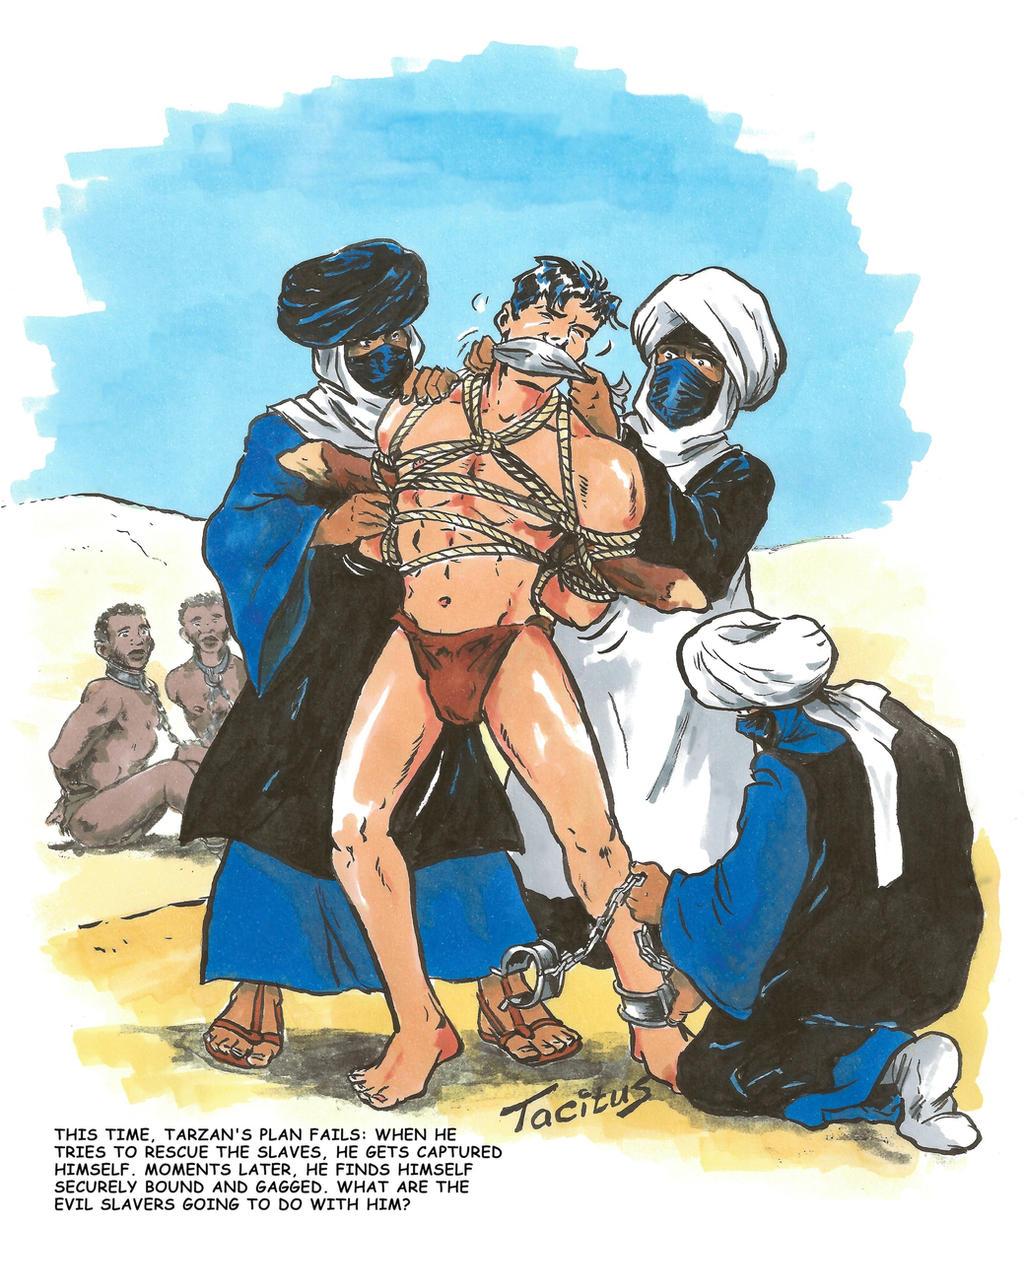 Tarzan captured by Arab slave traders by Tacitus3